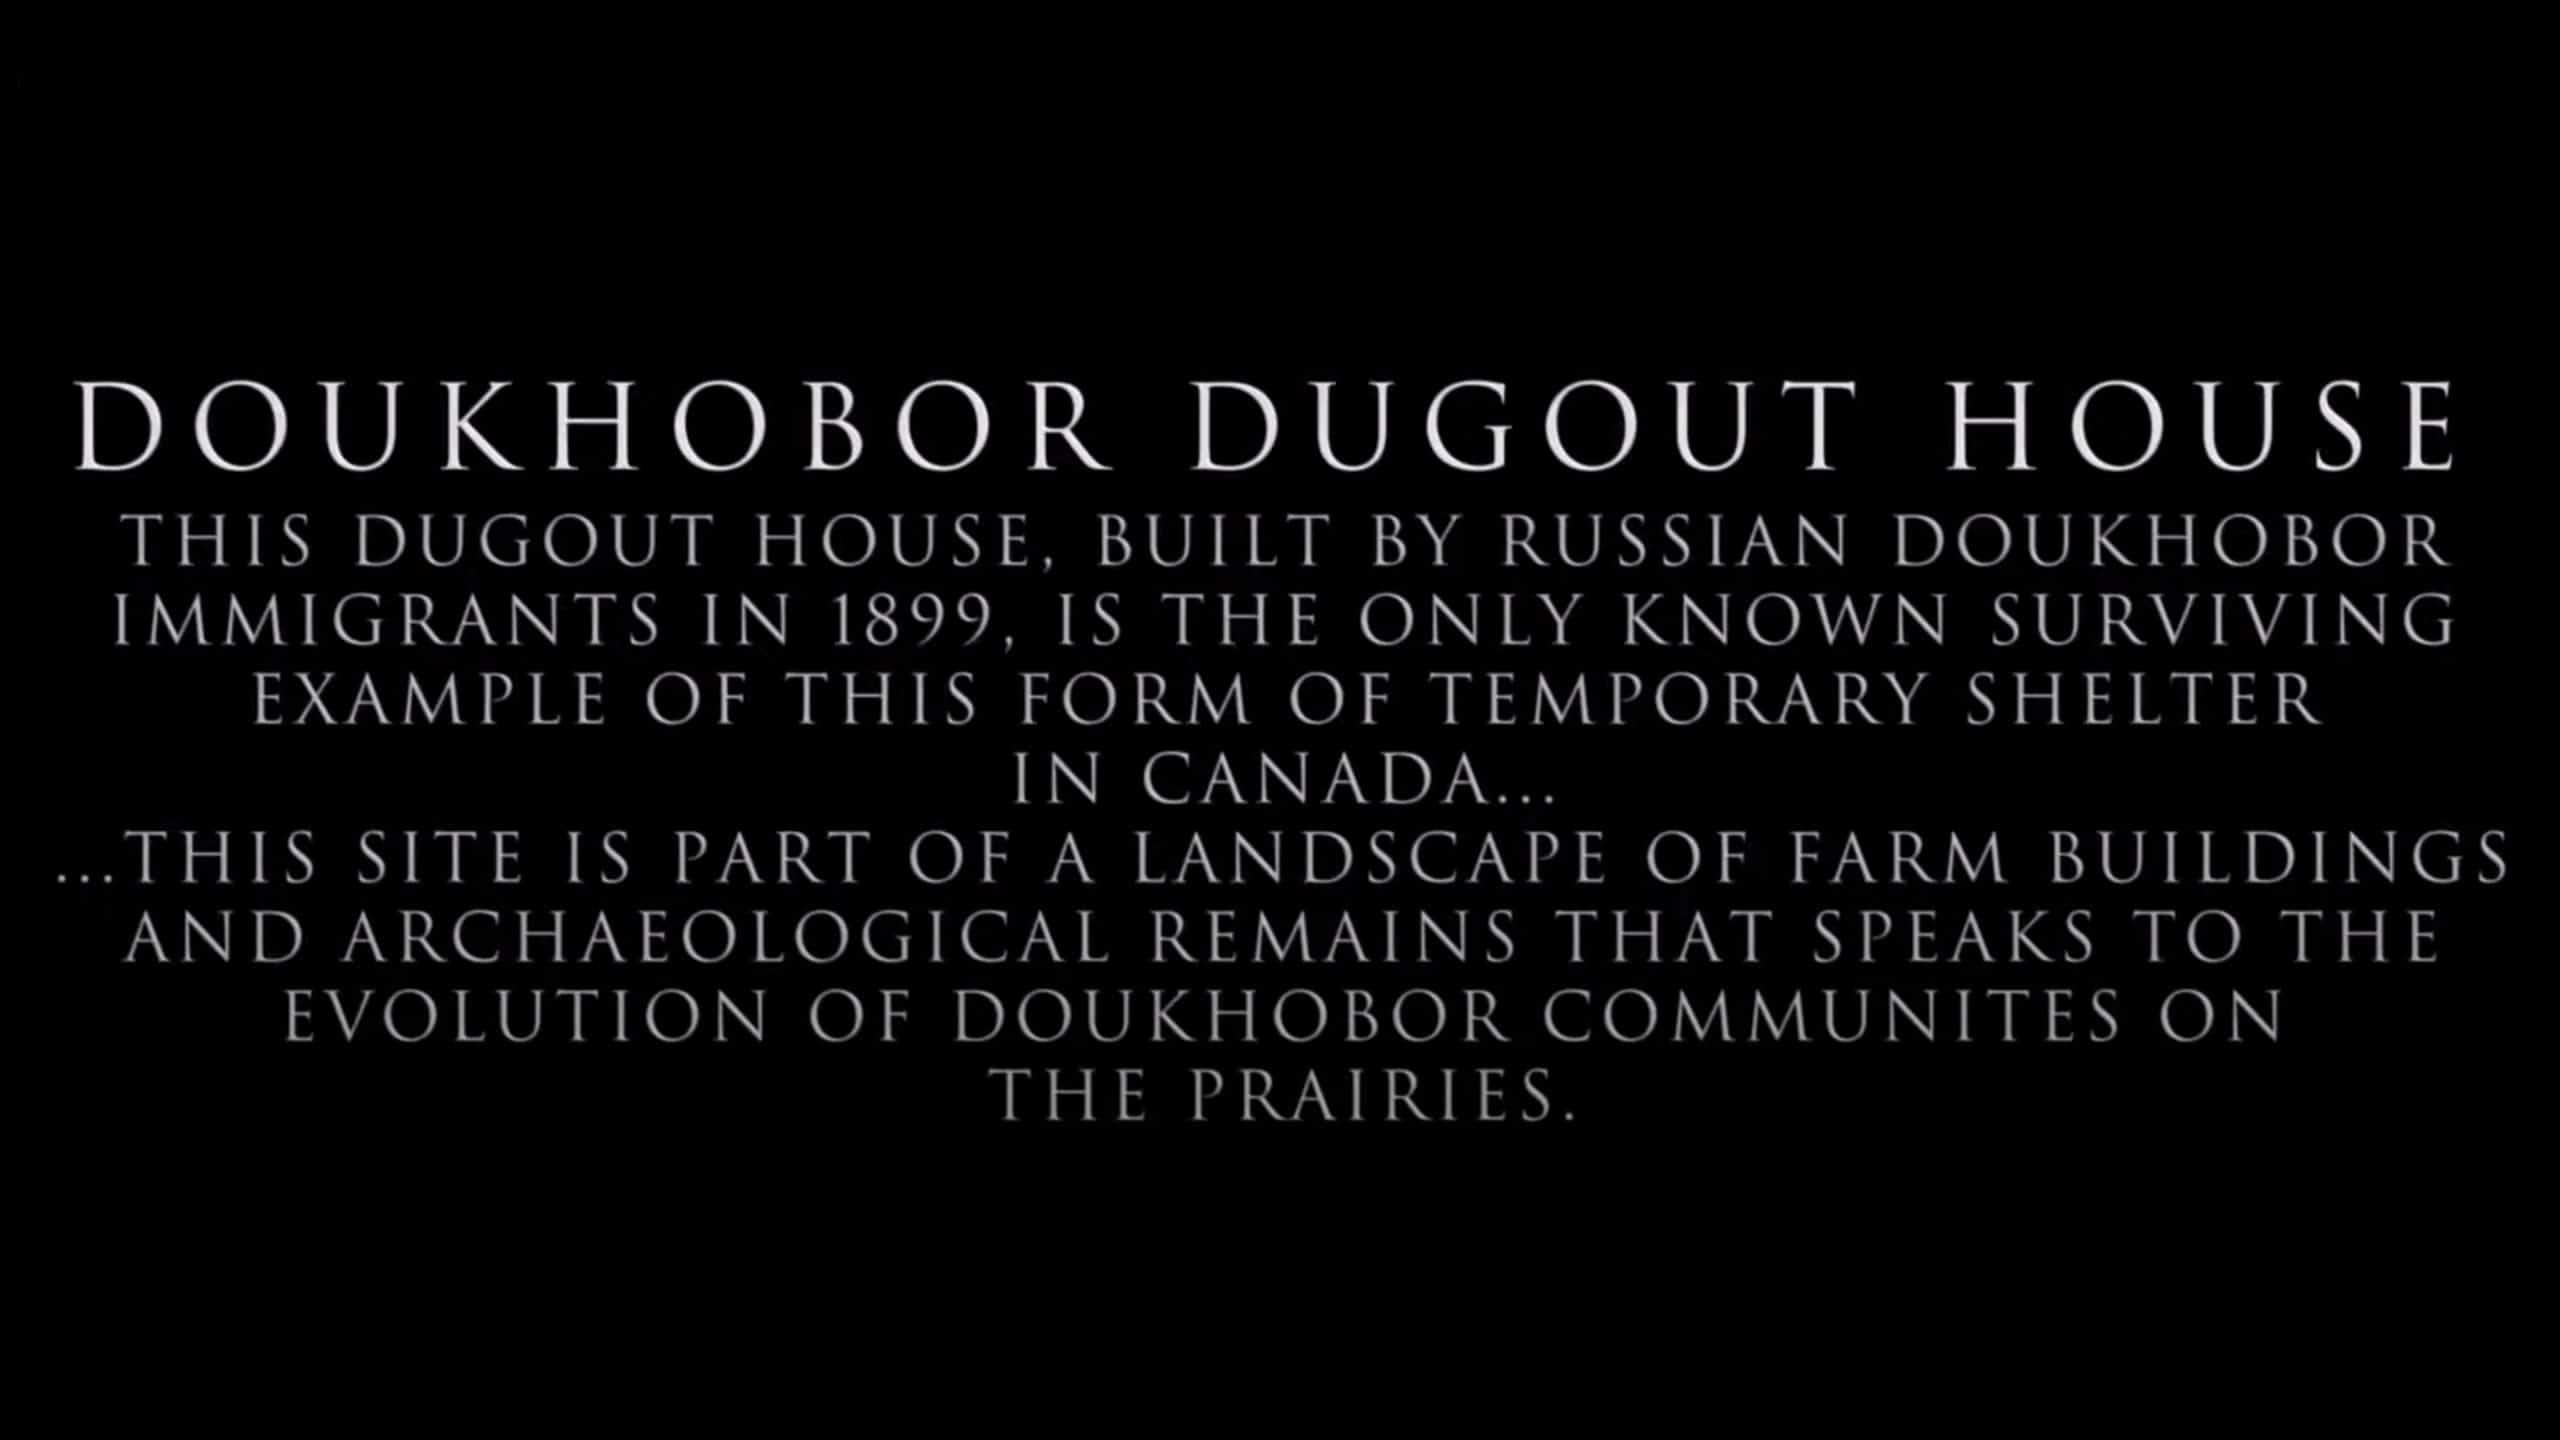 Doukhobor Dugout House